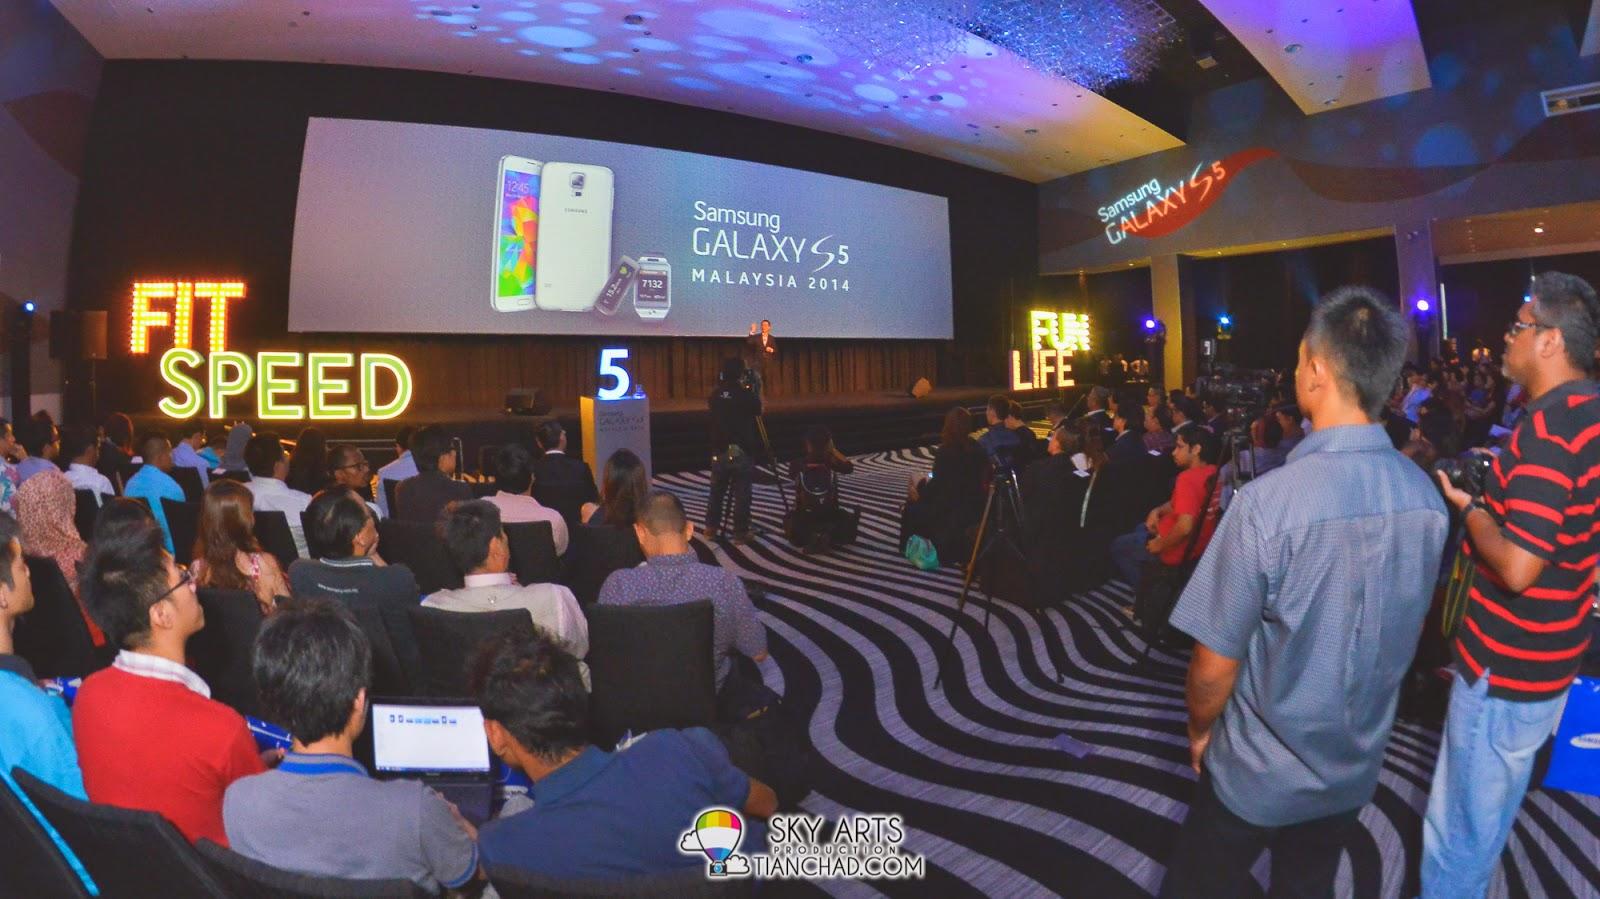 Samsung GALAXY S5 Launch @ Malaysia 2014